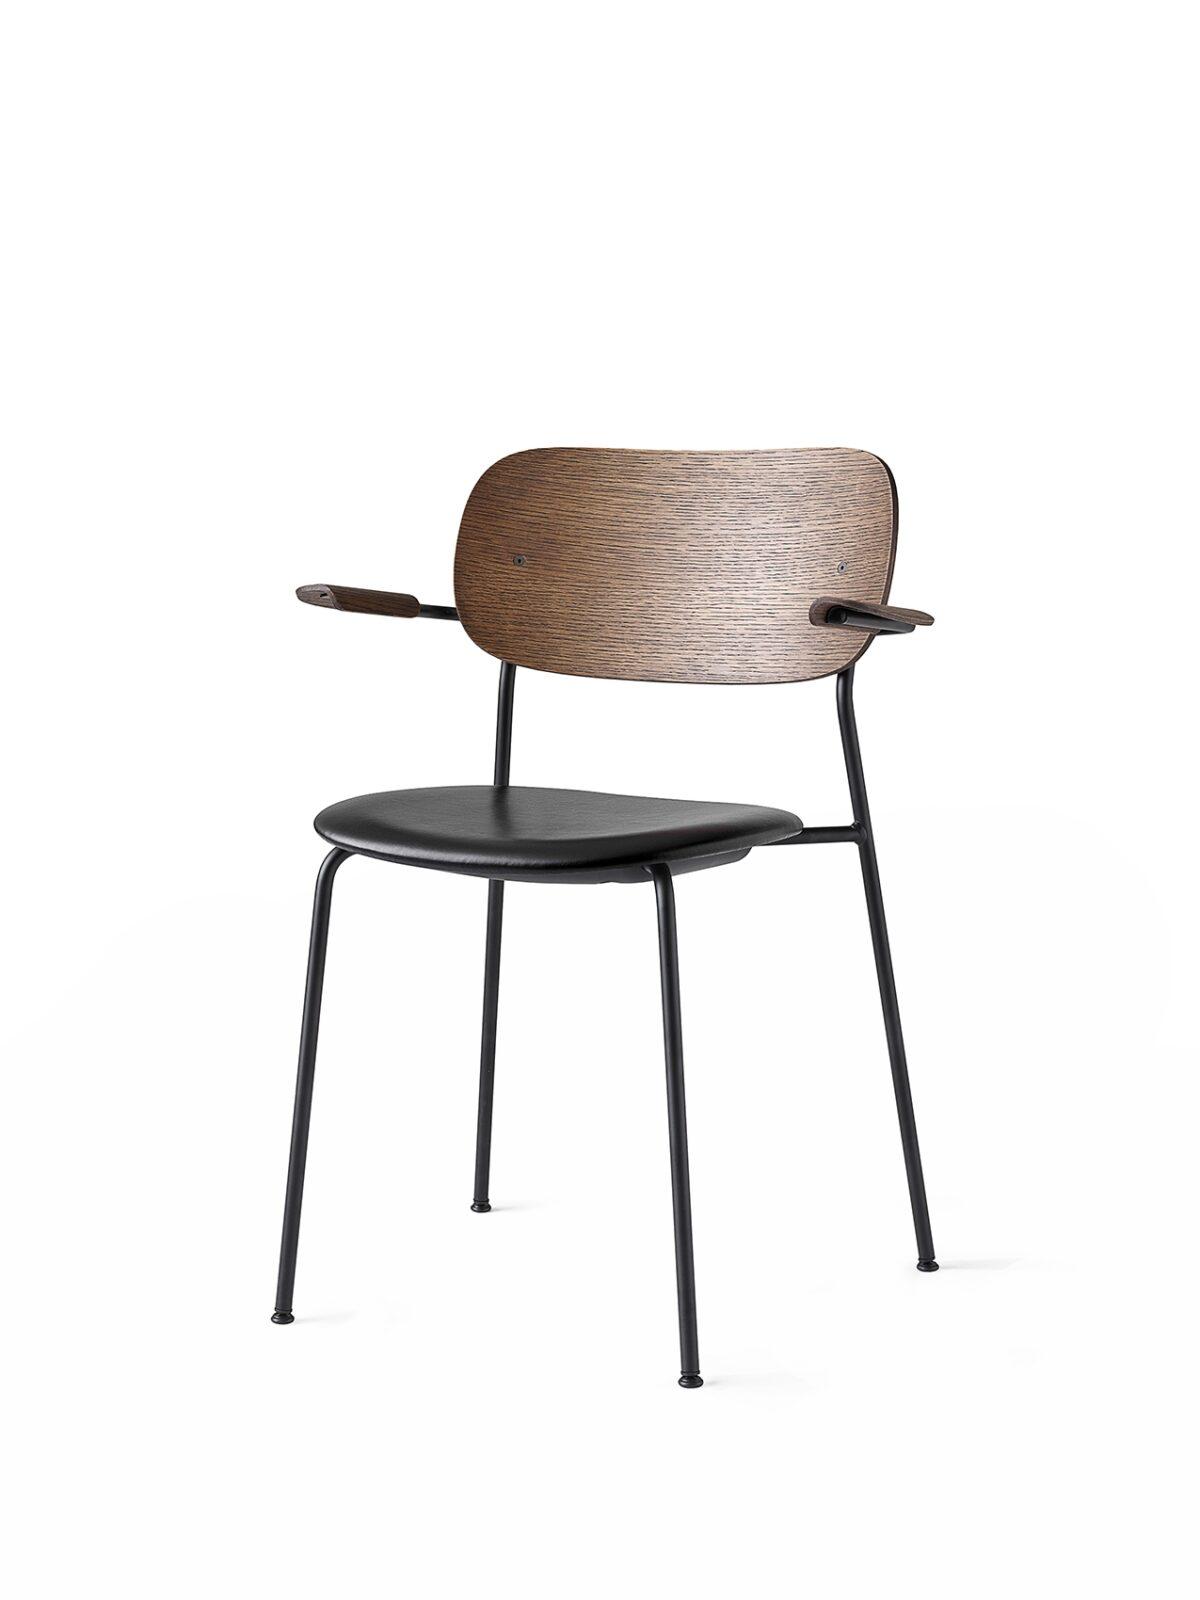 1169849 Co Dining Chair Armrest DakarBlack0842 DarkStainedOak Black Angle